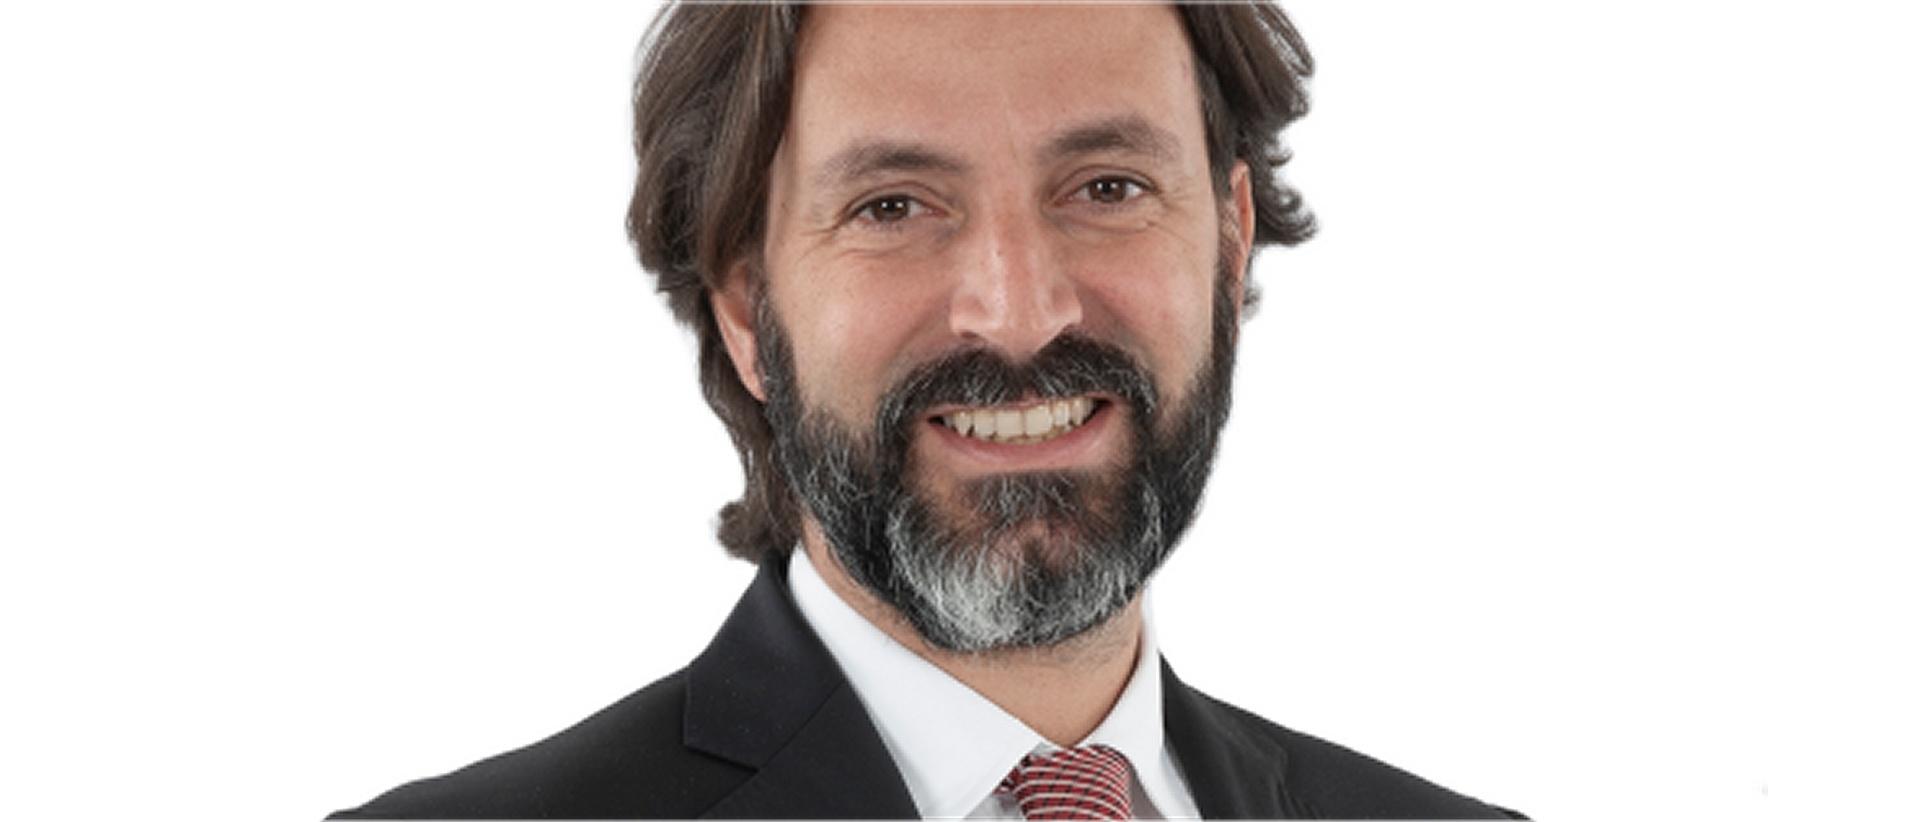 Francesco Siccardi